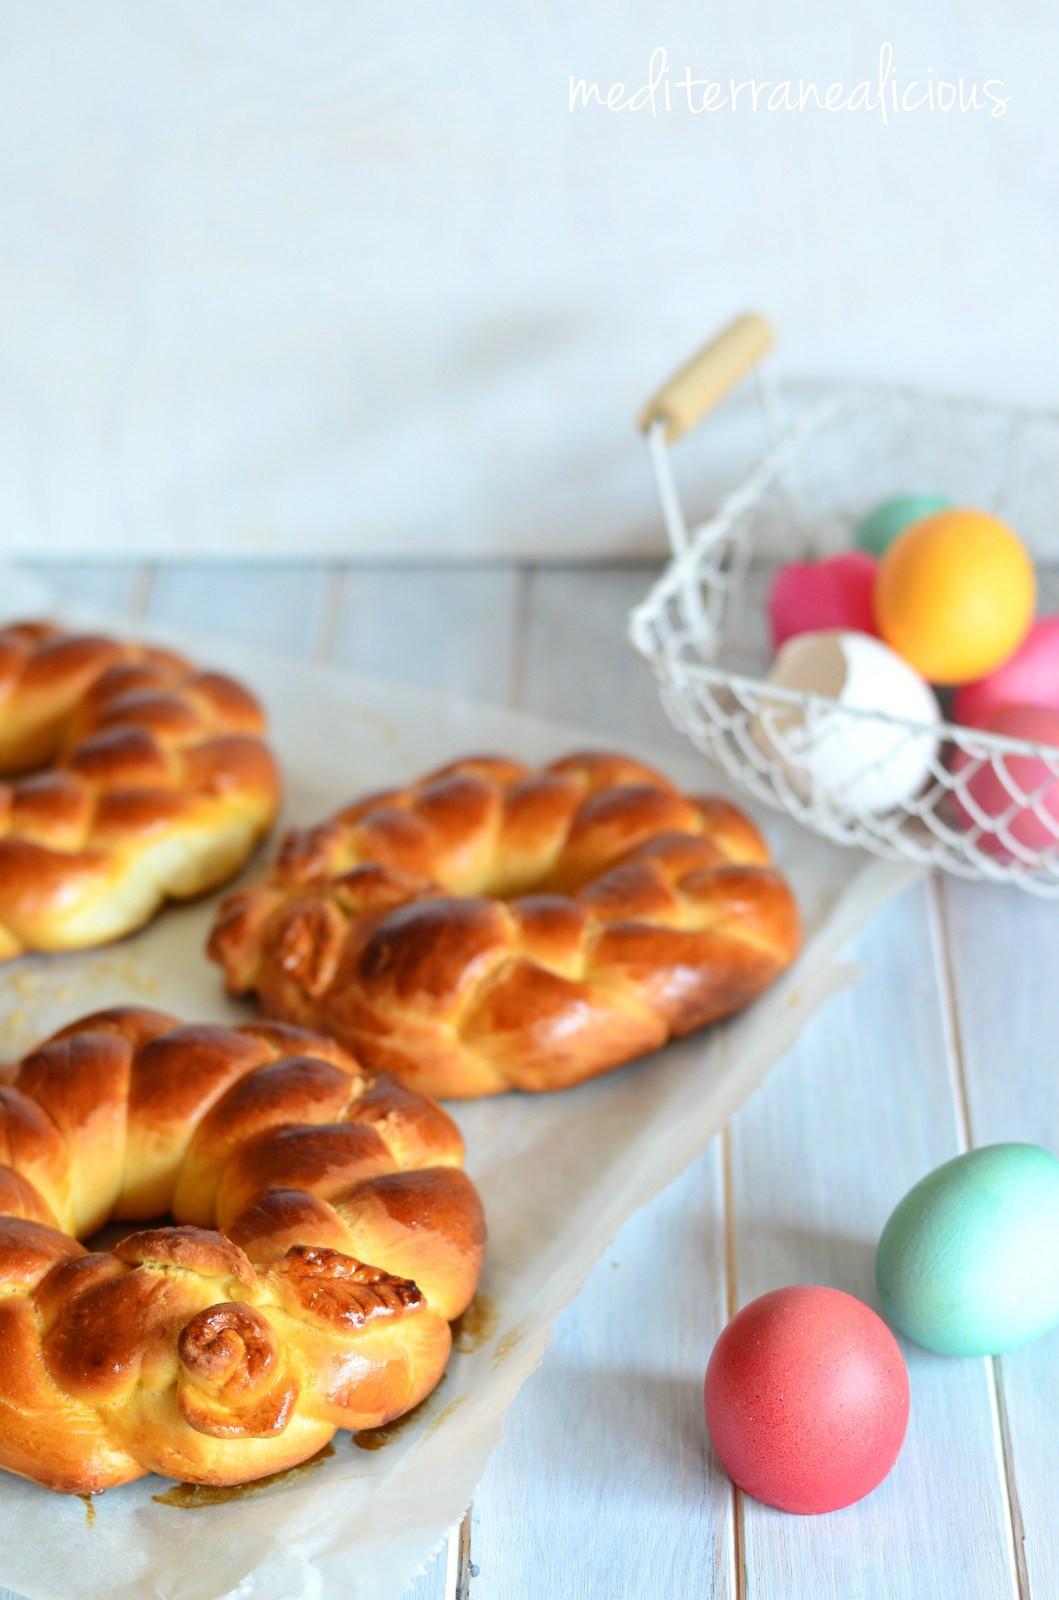 Braided Easter Bread  Cuddura My Family s Braided Easter Bread